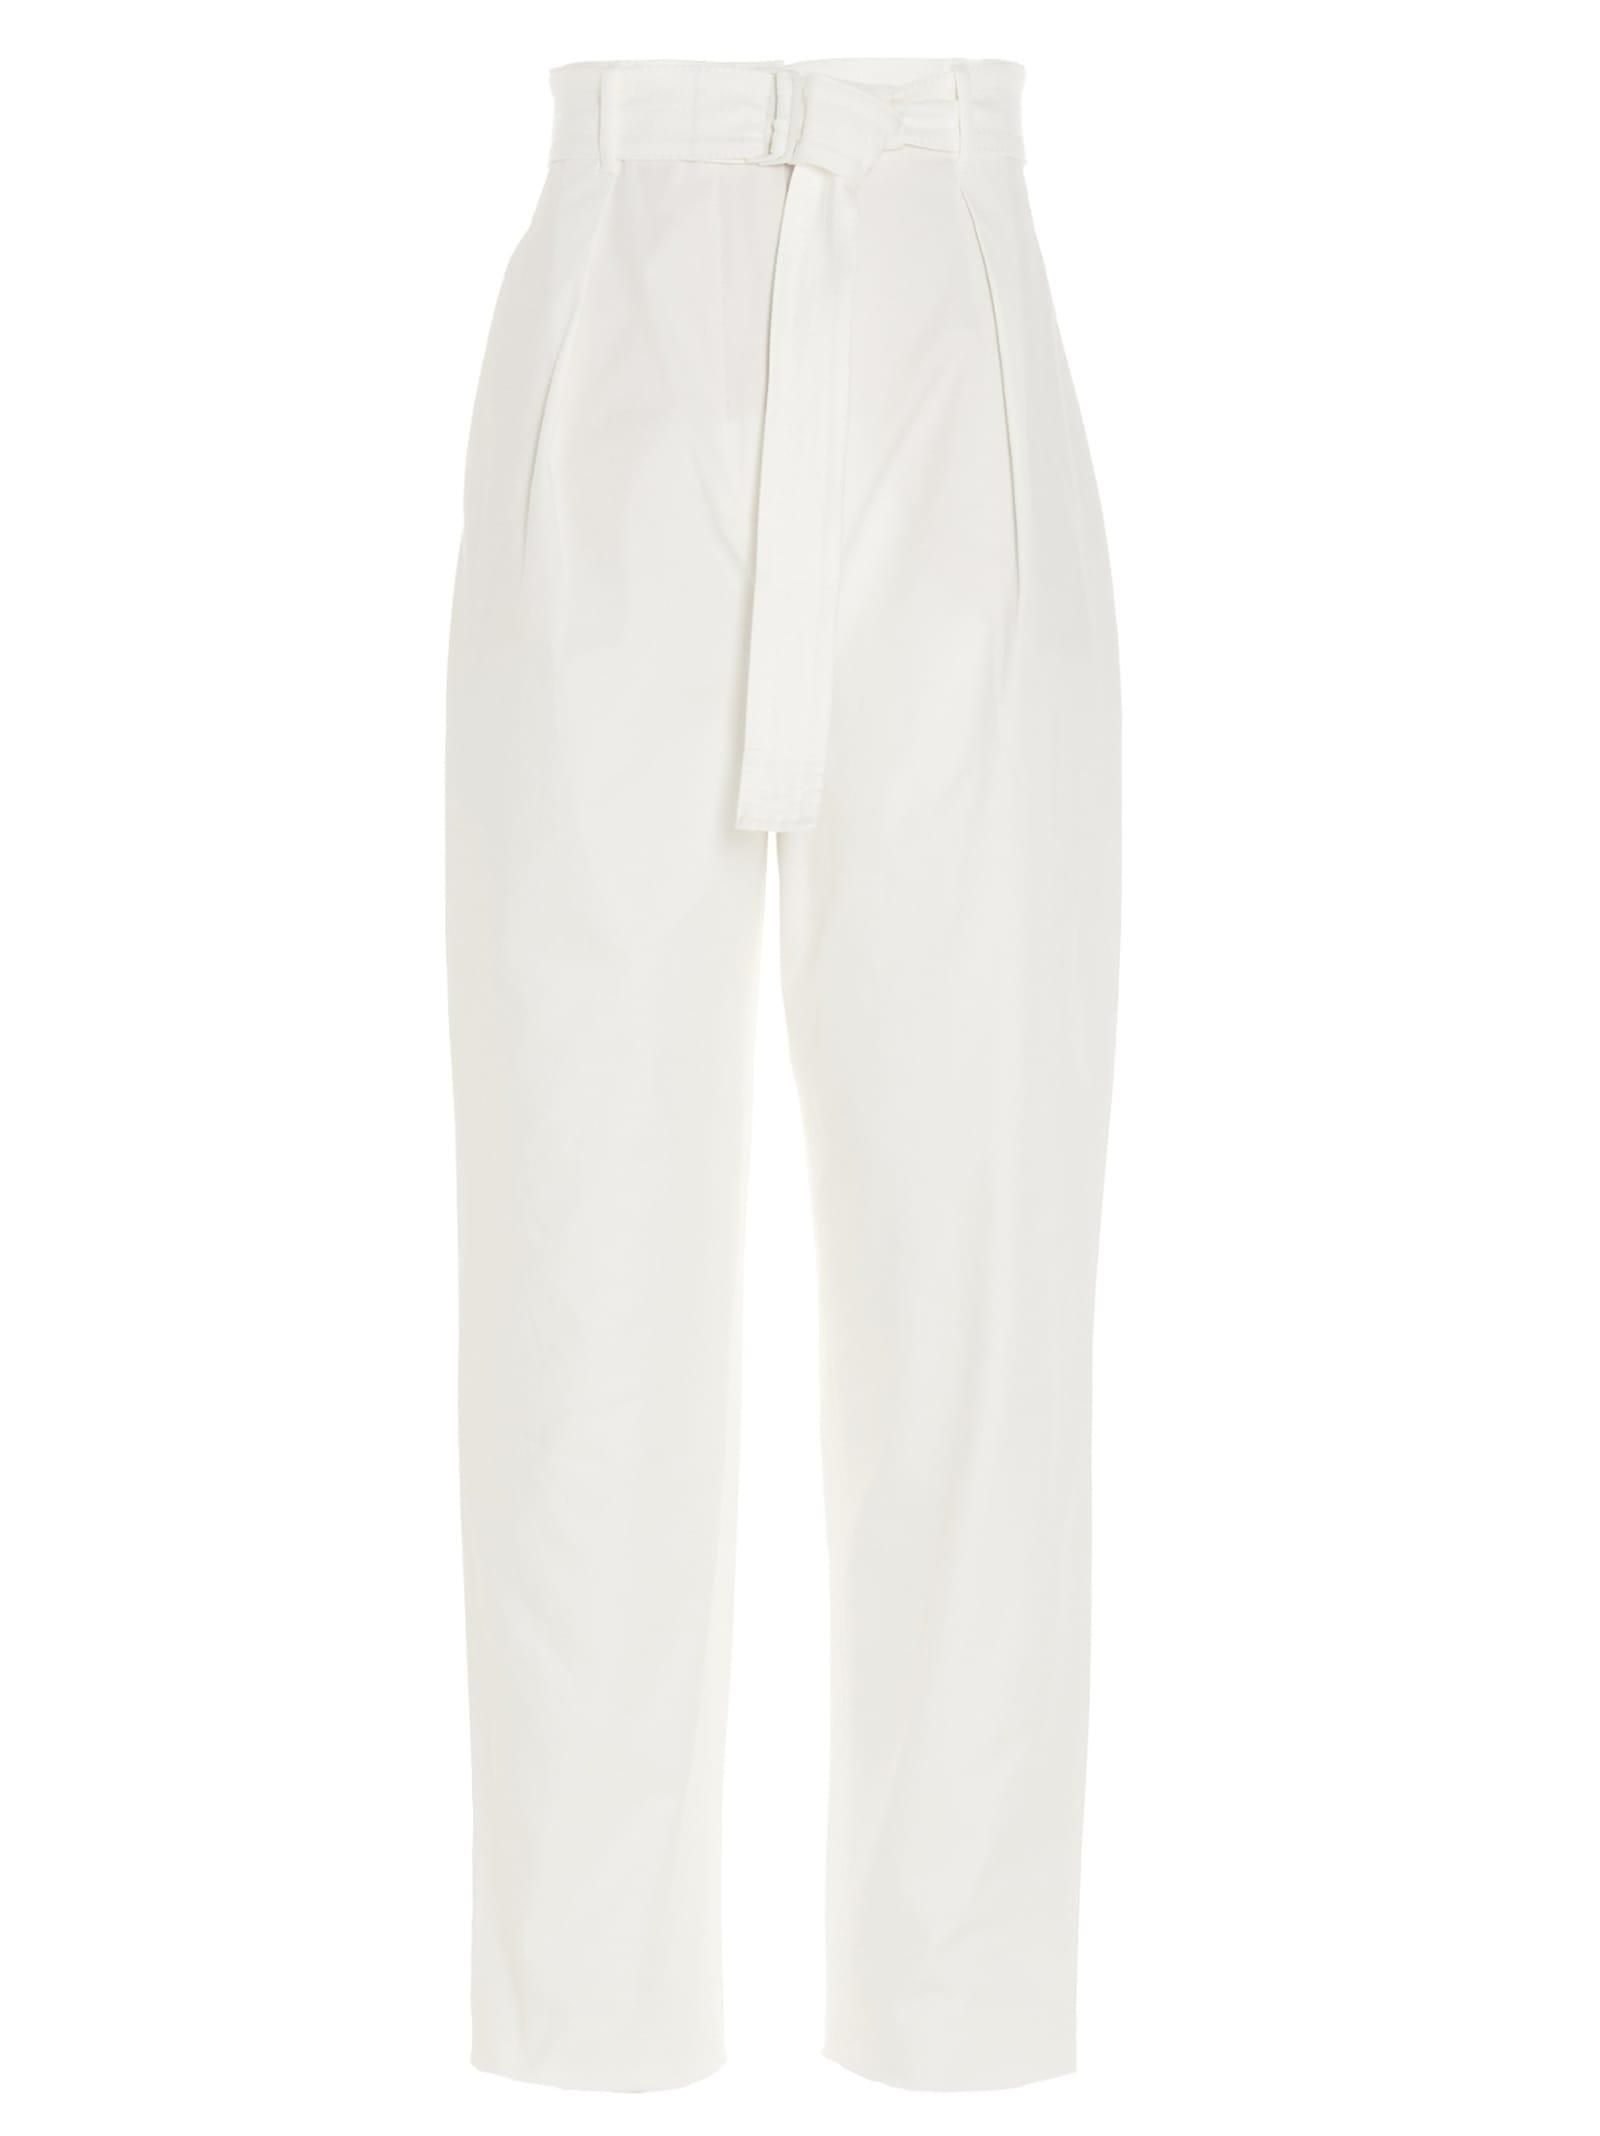 Max Mara Clothing TIBET PANTS